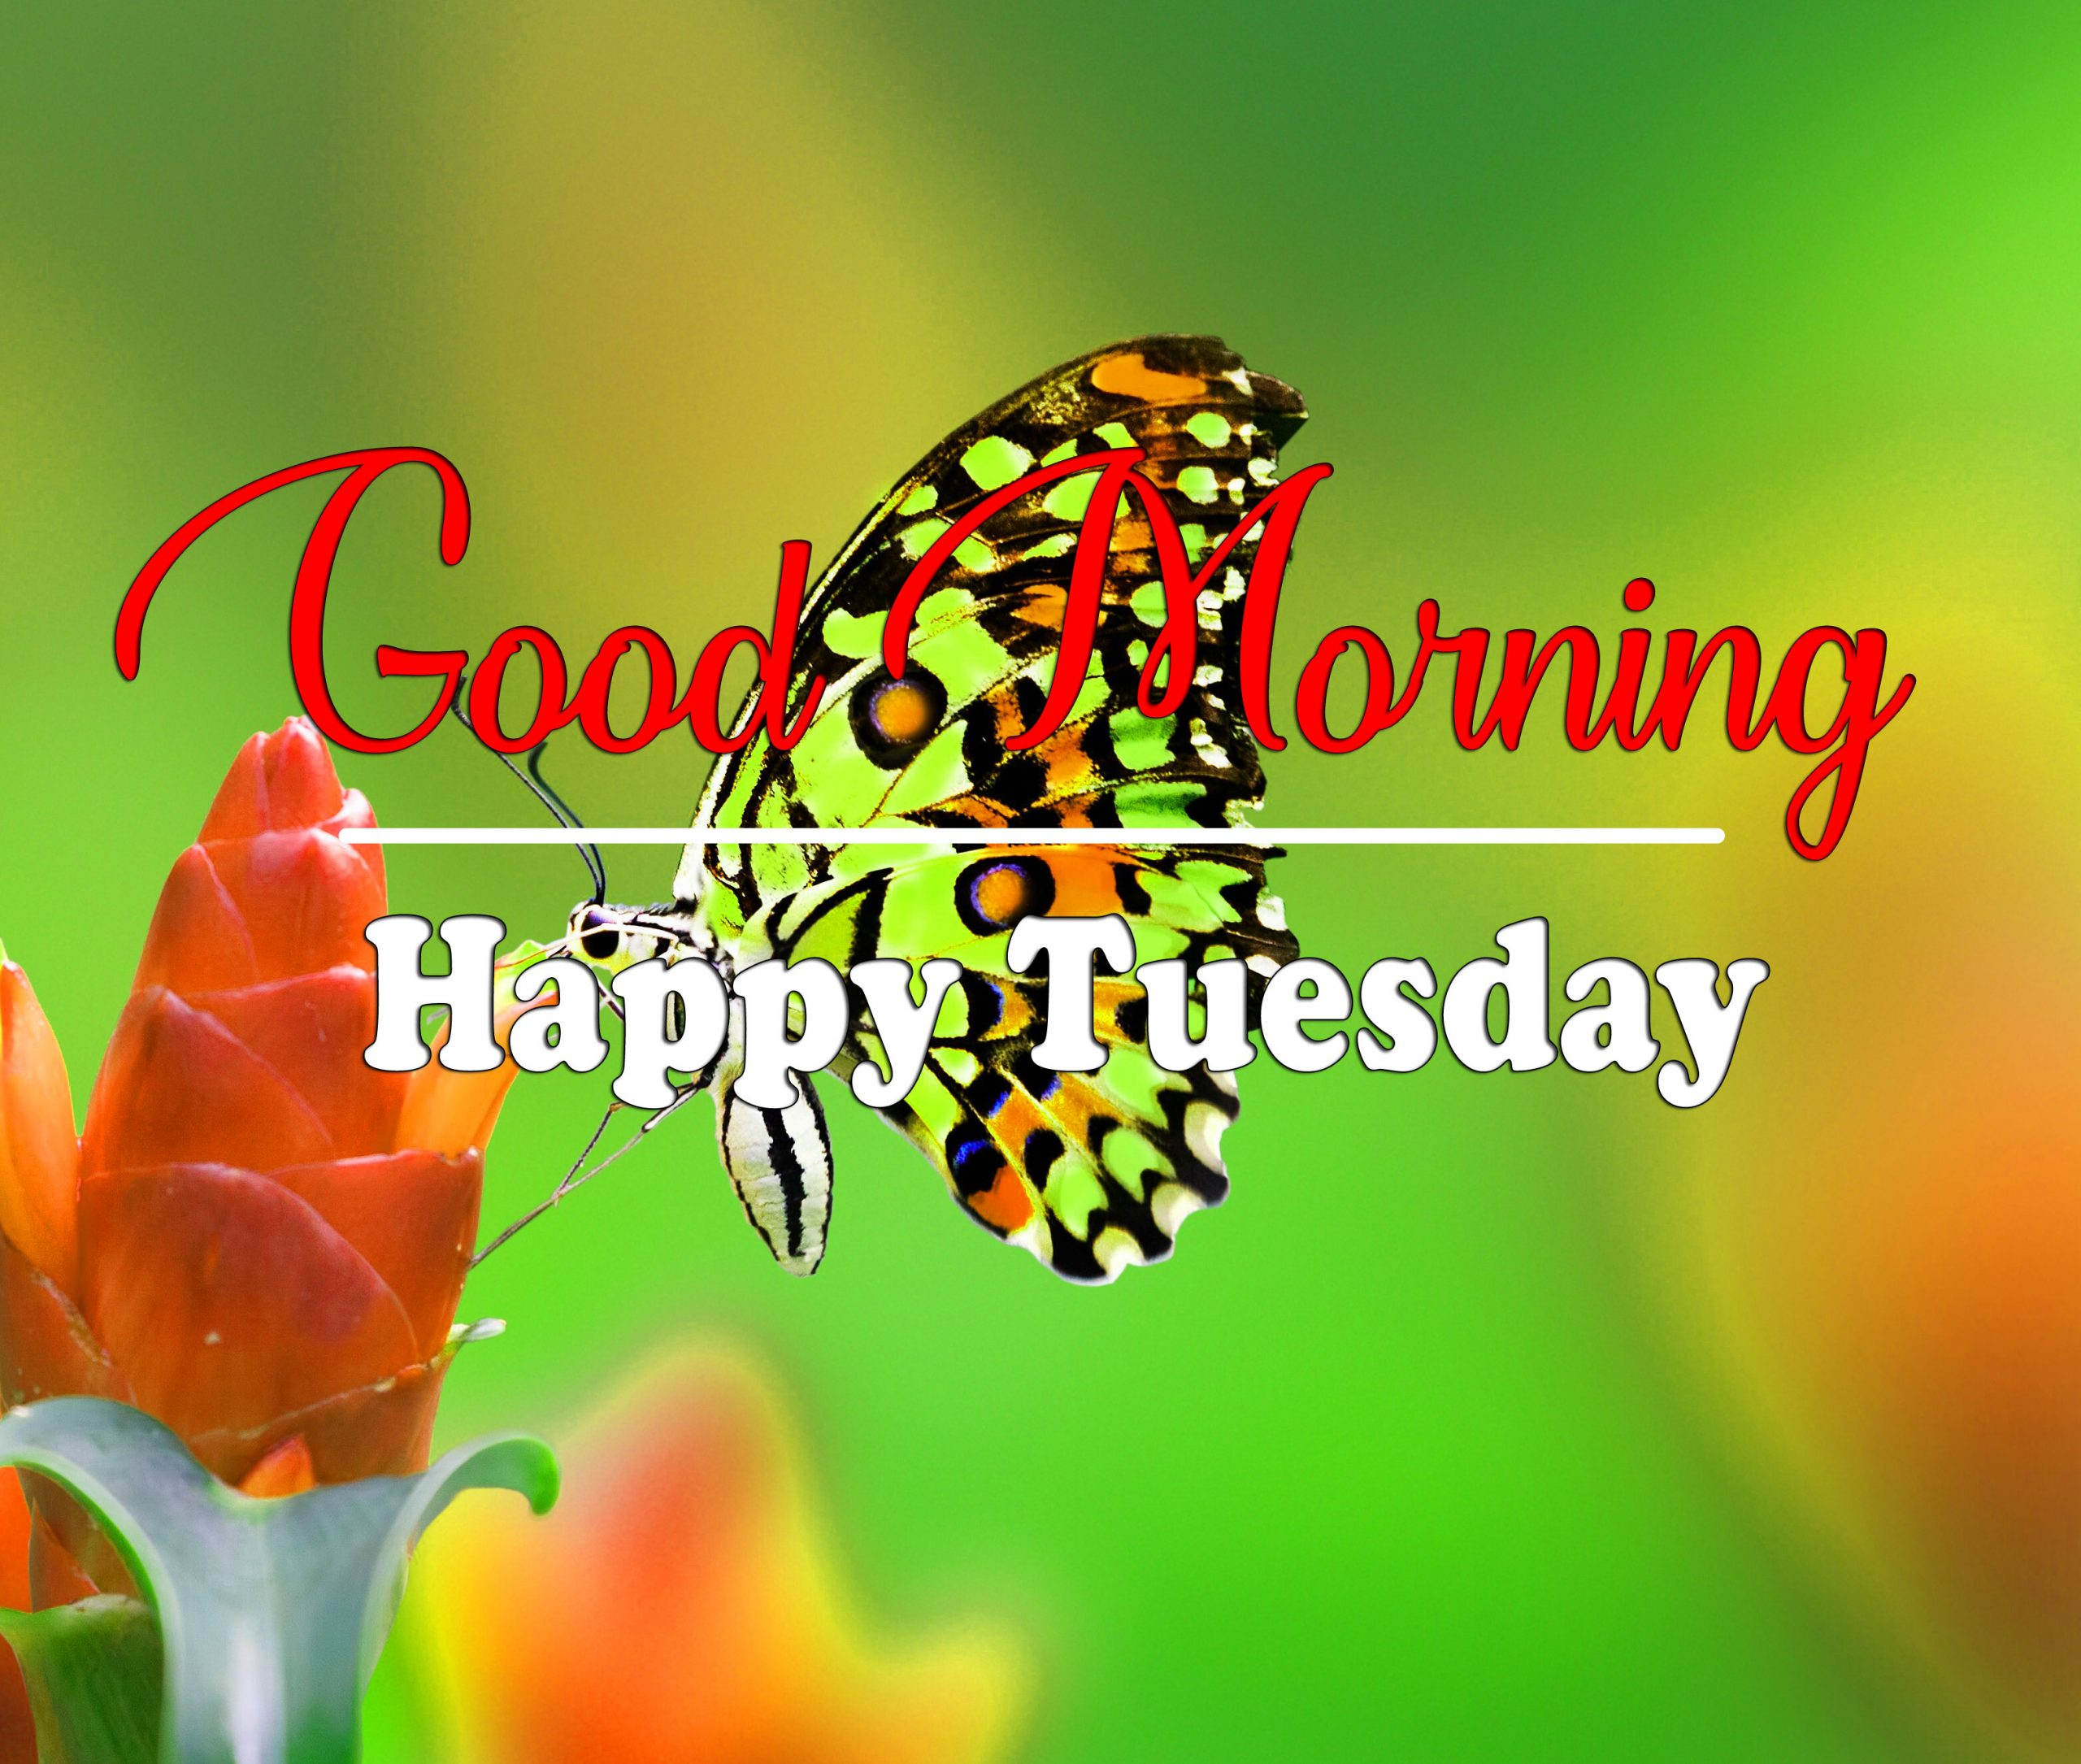 Fresh Tuesday Good morning Images 2021